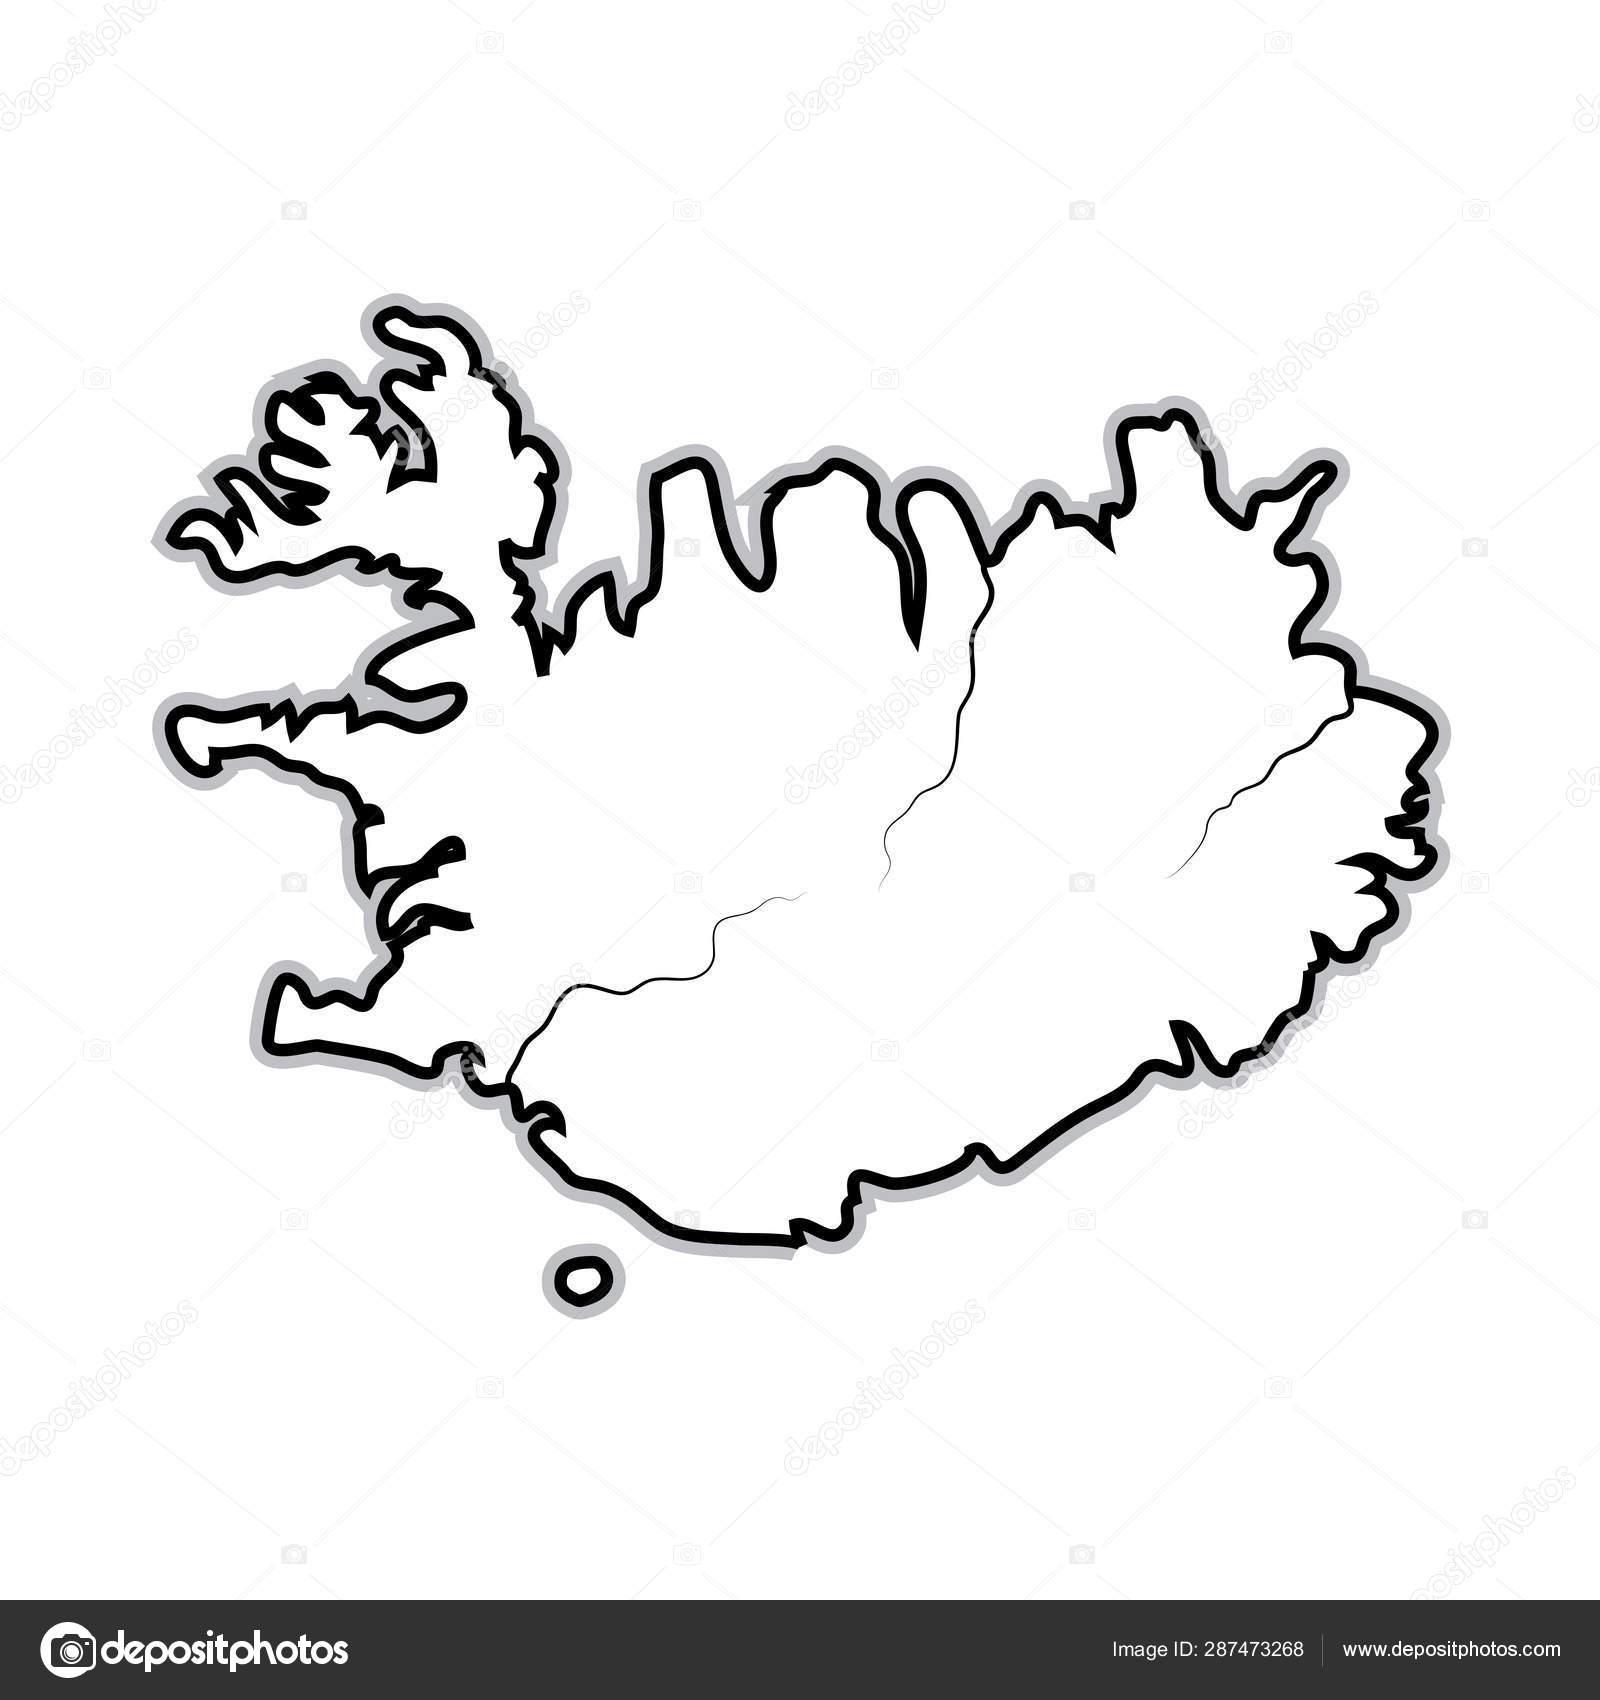 World Map of ICELAND: Iceland, Scandinavia, North Europe, Atlantic on western samoa world map, kazakhstan world map, panama world map, faroe islands, lesotho world map, sri lanka world map, united kingdom, new zealand, japan world map, indonesia world map, ireland world map, antartica world map, scotland world map, germany world map, india world map, british isles world map, cape verde world map, south korea world map, austria world map, guam world map, ceylon world map, norway world map, haiti world map,